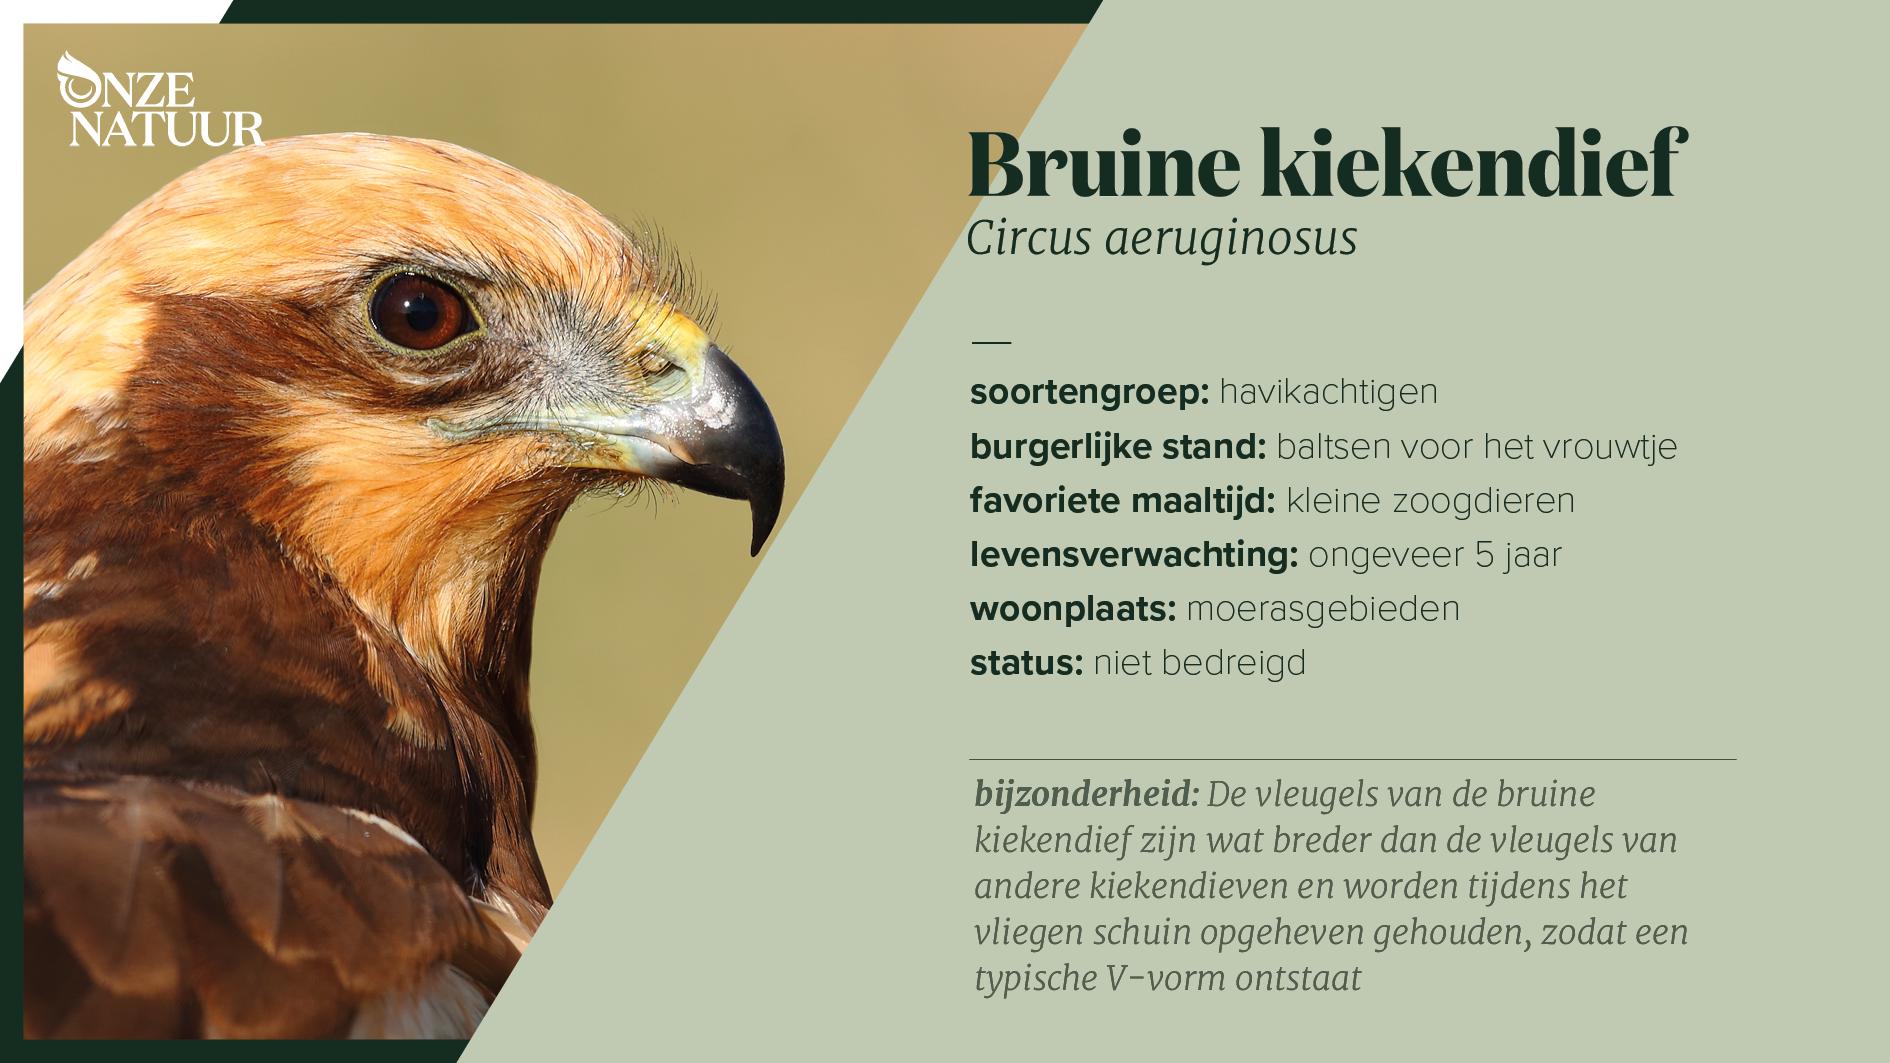 on-fiche-bruine-kiekendief-nl.png